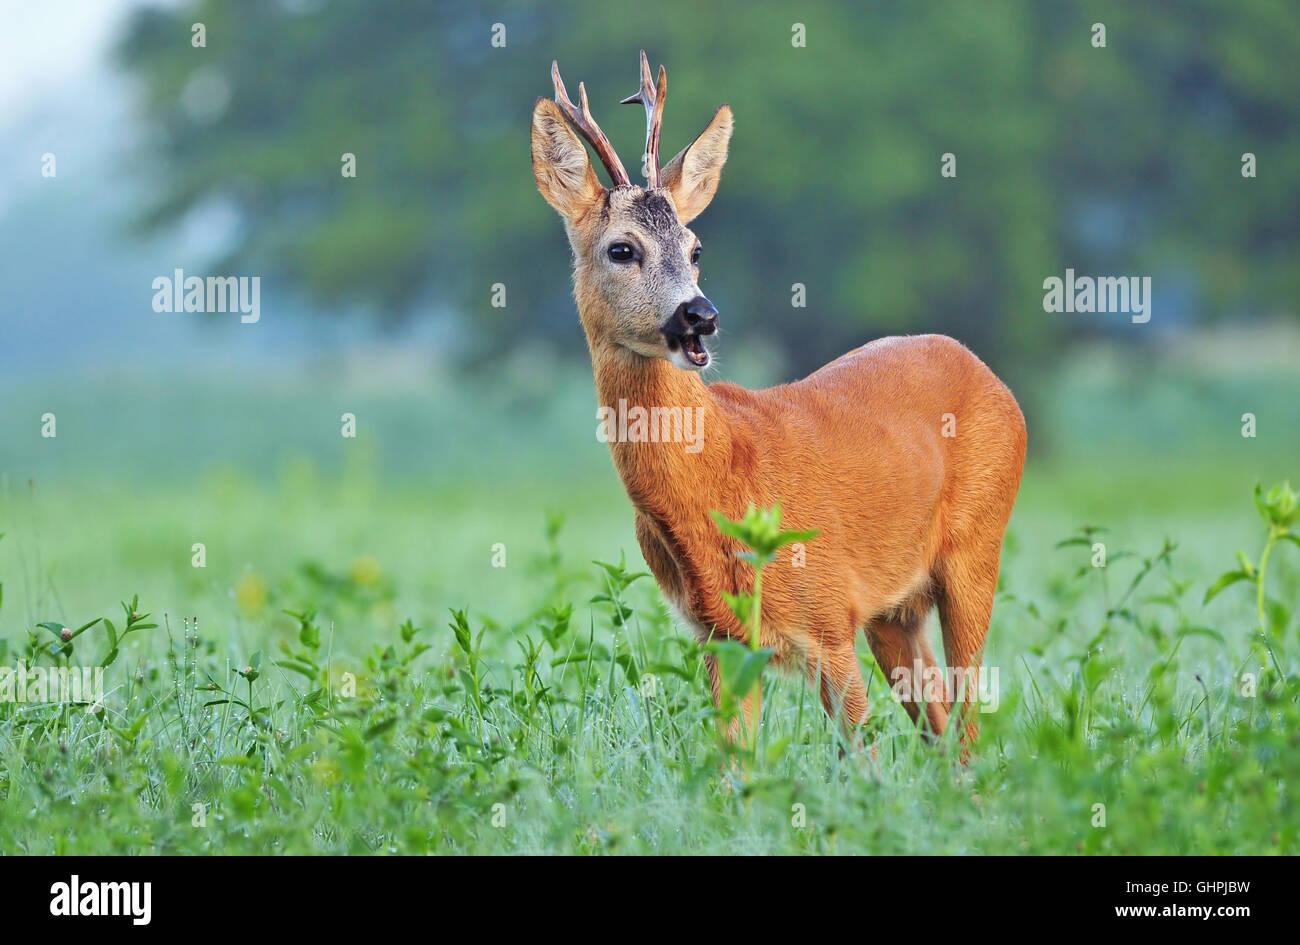 Wild roe deer (Capreolus capreolus) standing in a field Stock Photo